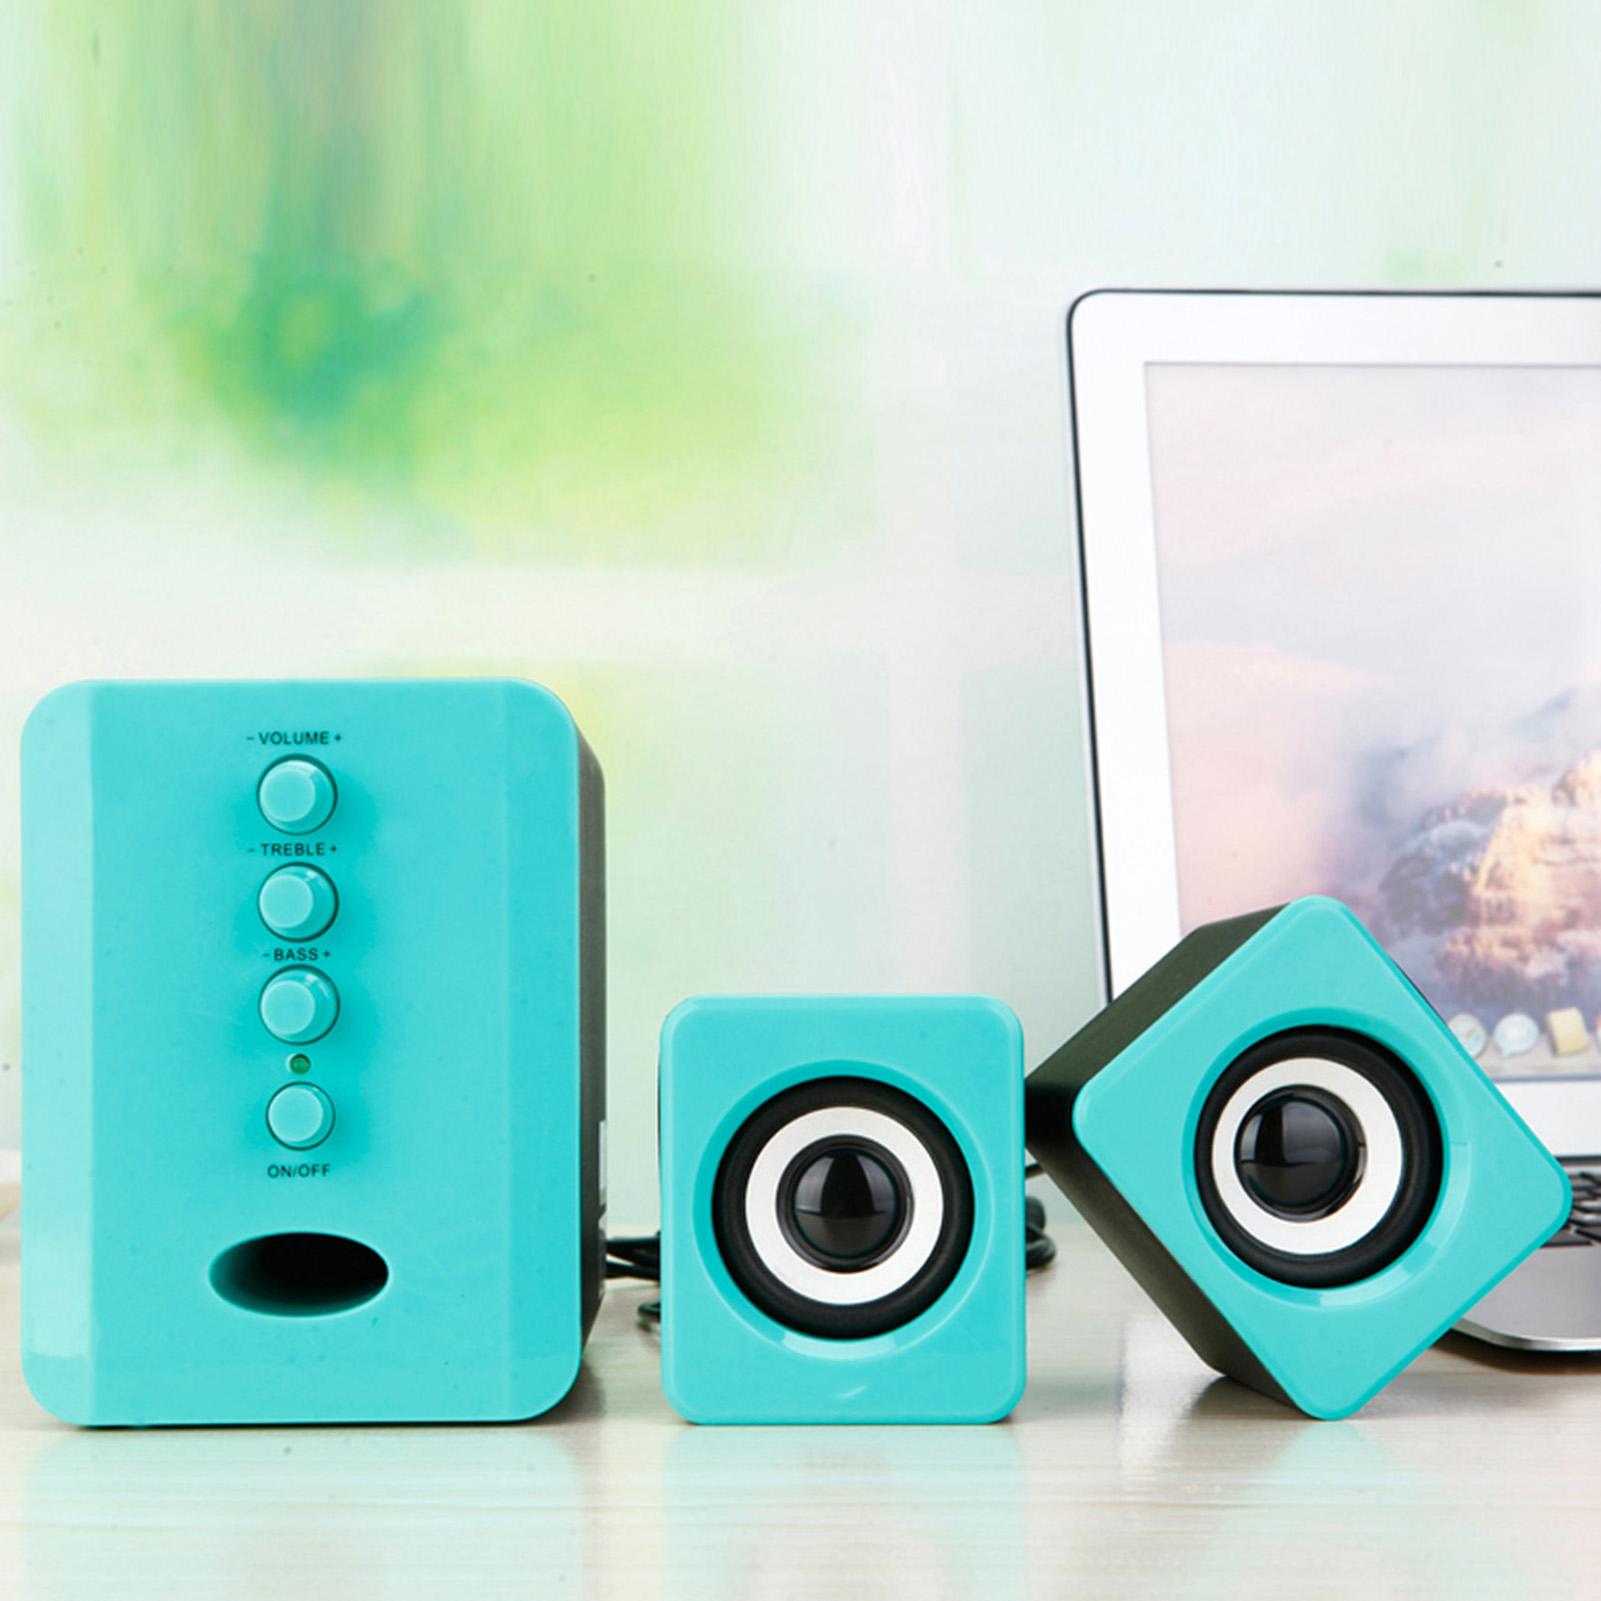 SADA-Bluetooth-Computer-Speaker-Desktop-Laptop-PC-Stereo-Subwoofer-Multimedia thumbnail 82